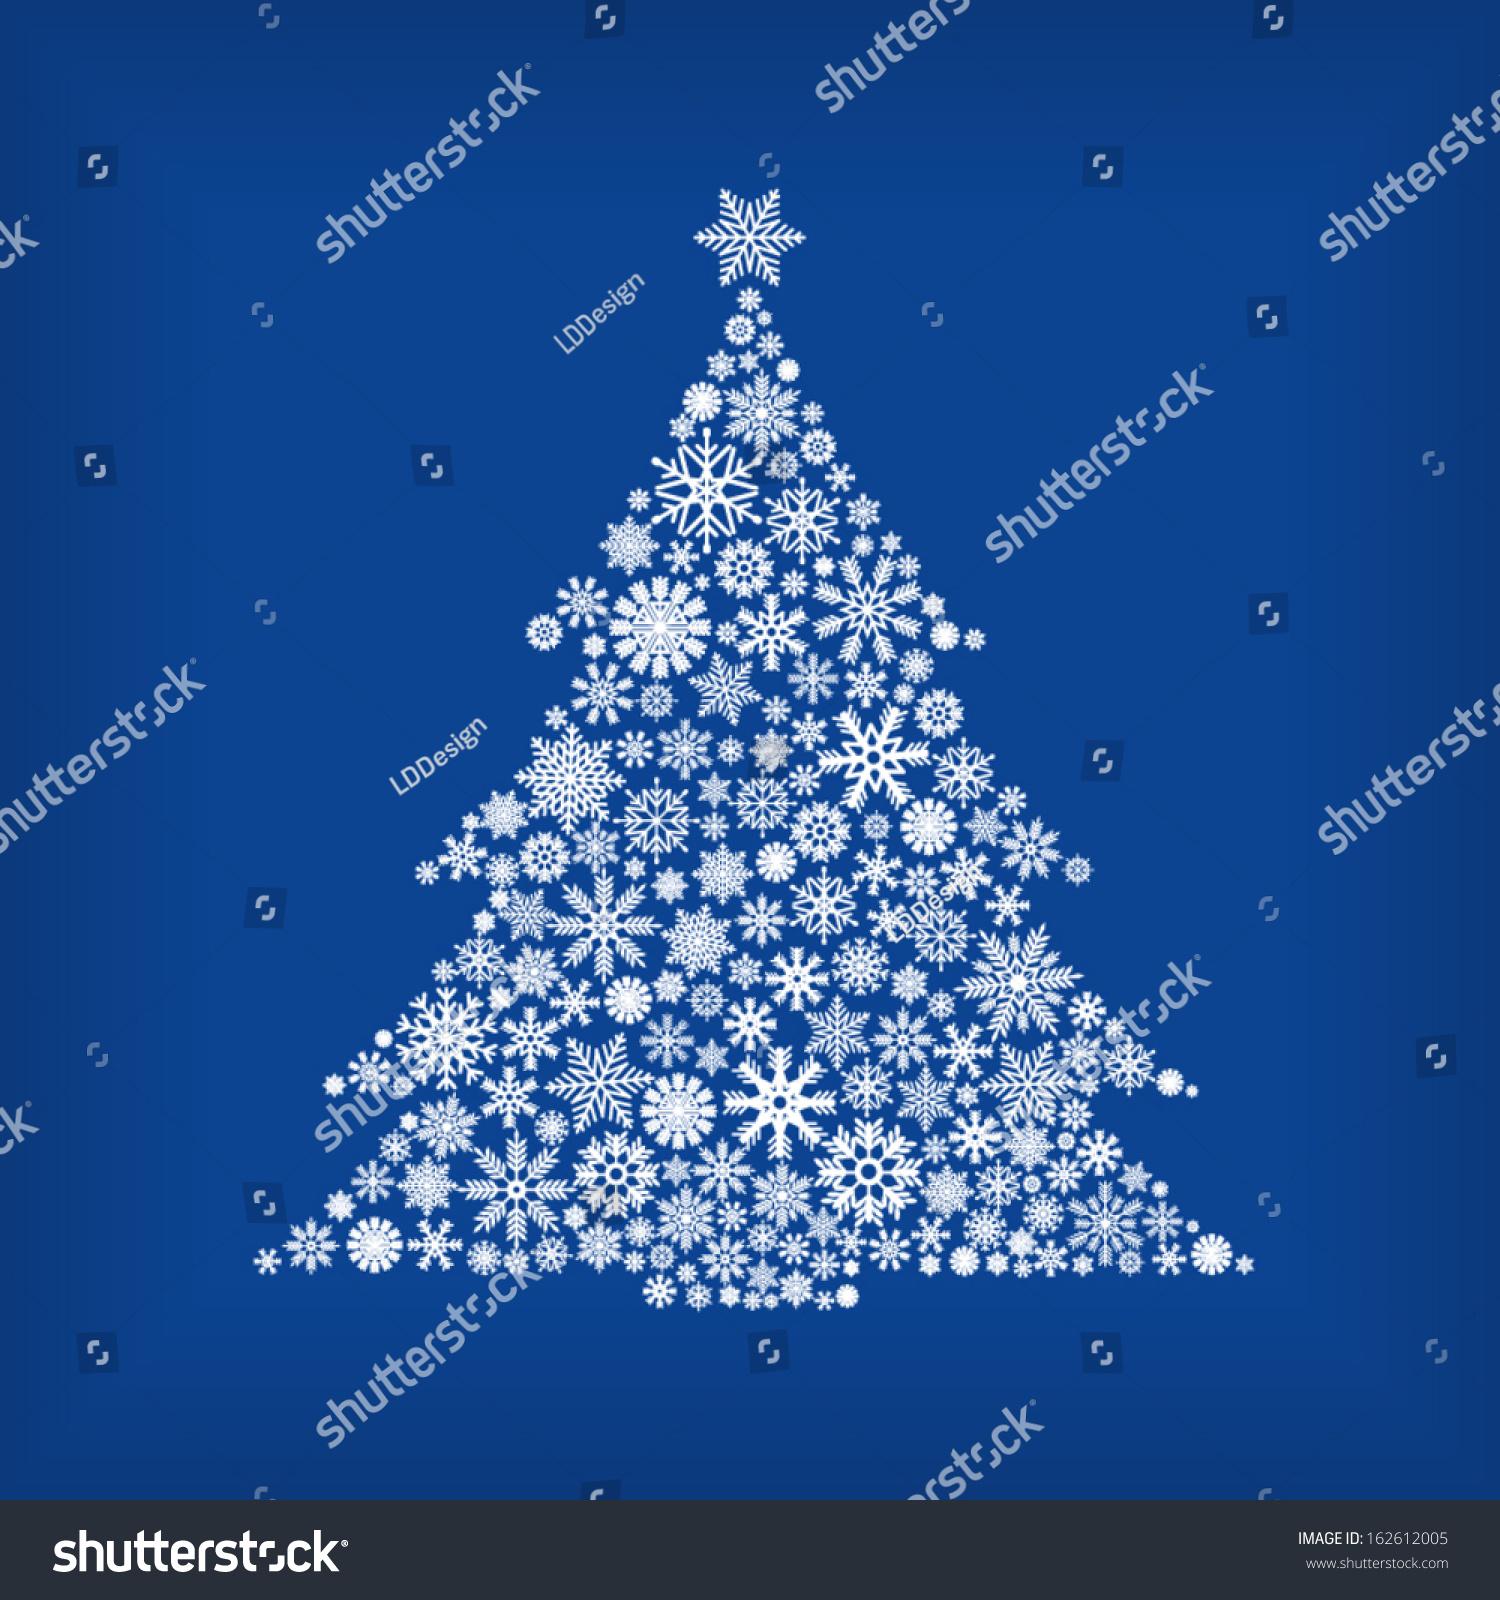 Christmas Tree Snowflakes Blue